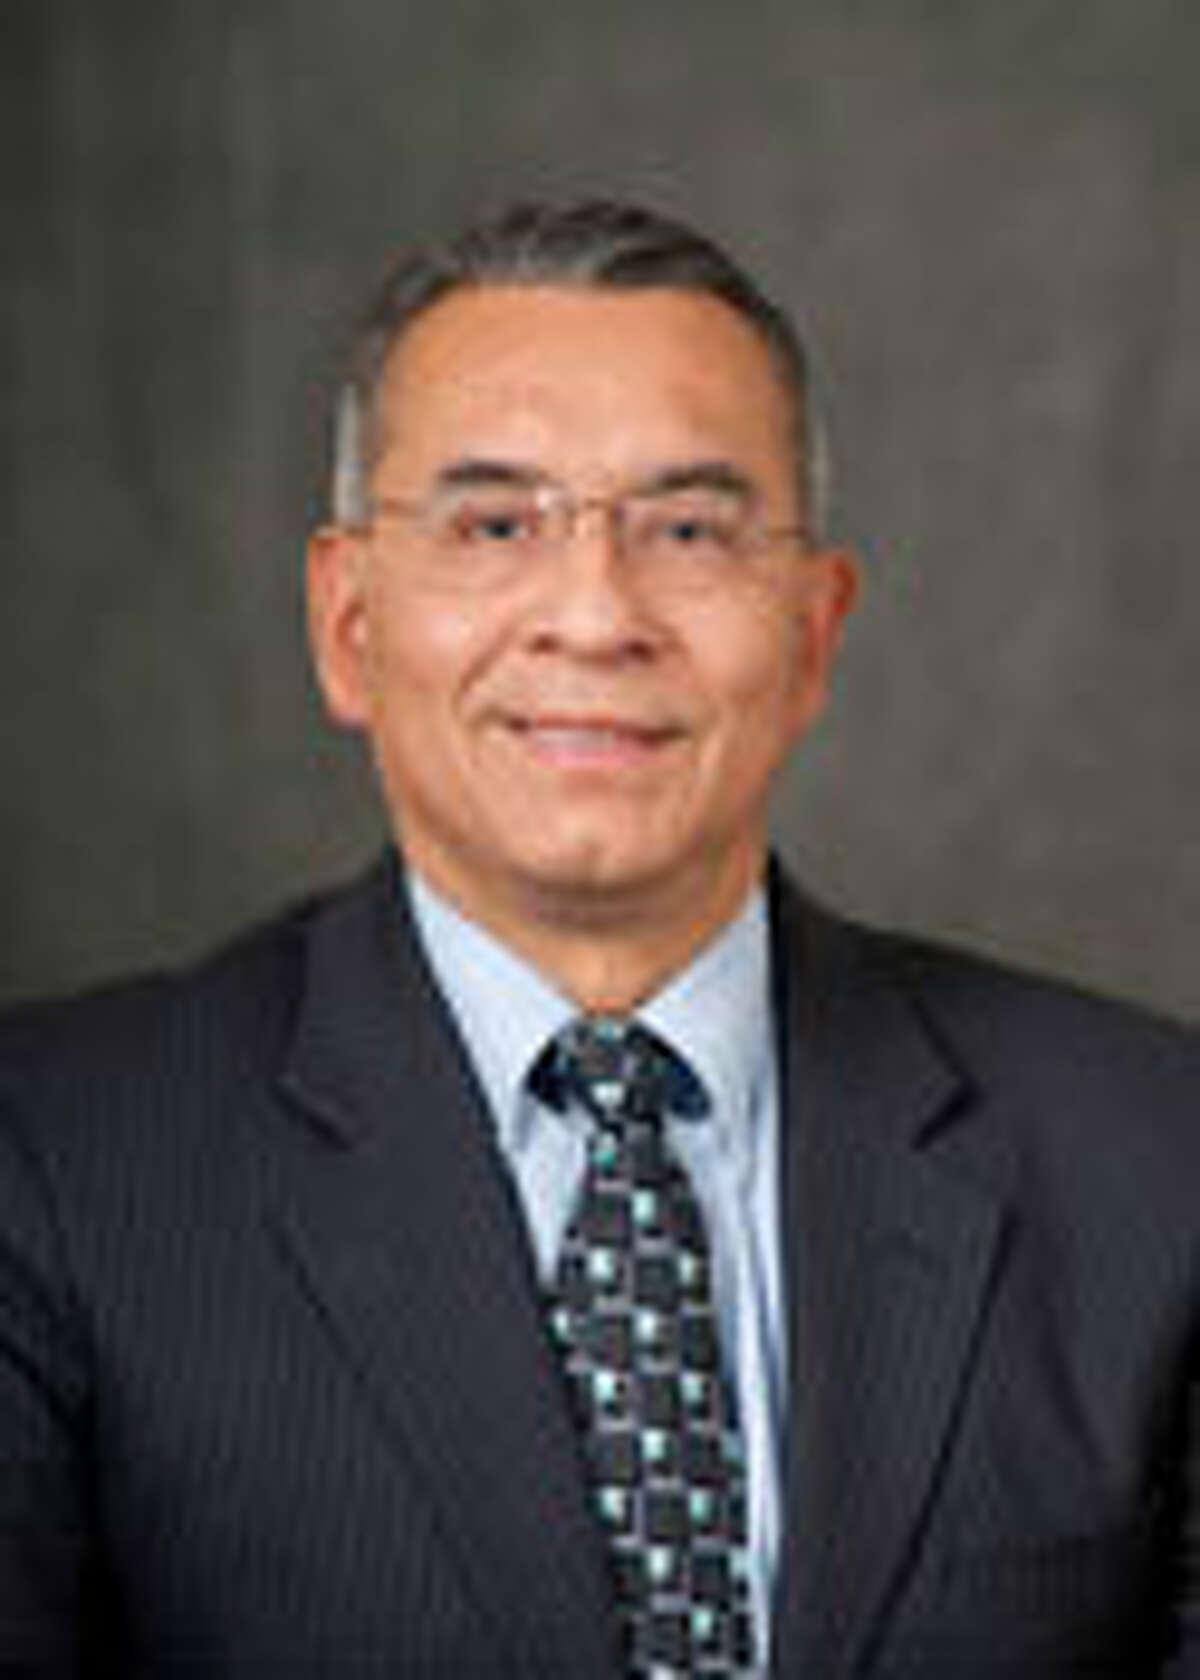 Rep. Raul Torres, R-Corpus Christi